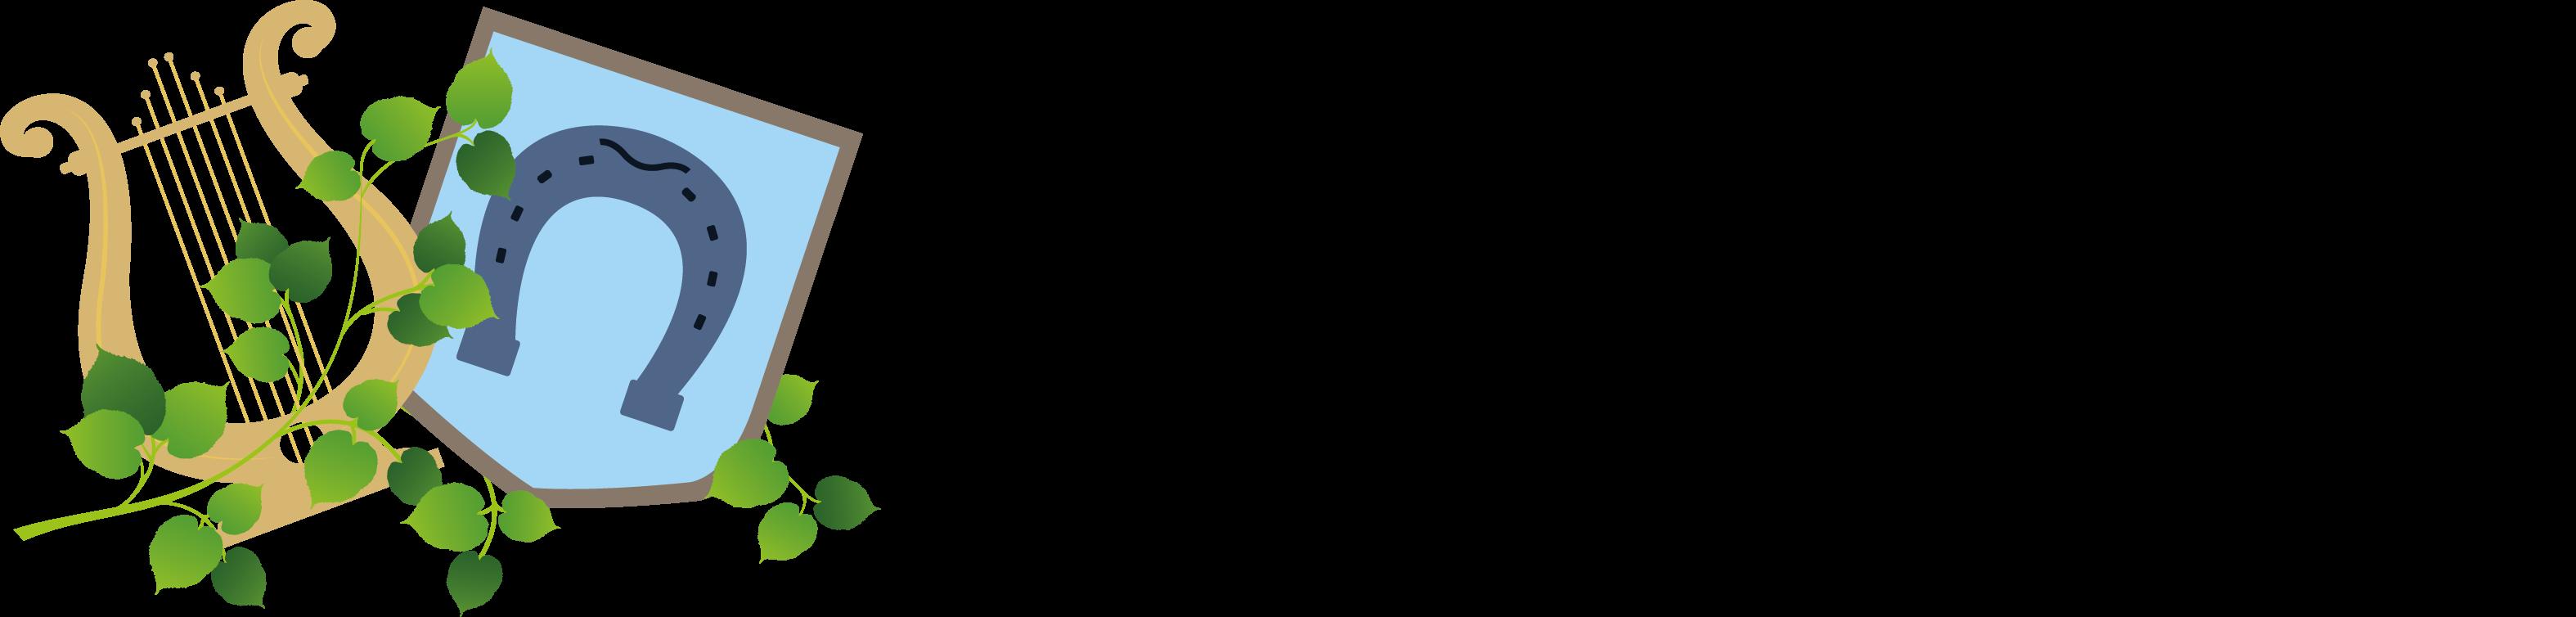 MGV Schwegenheim